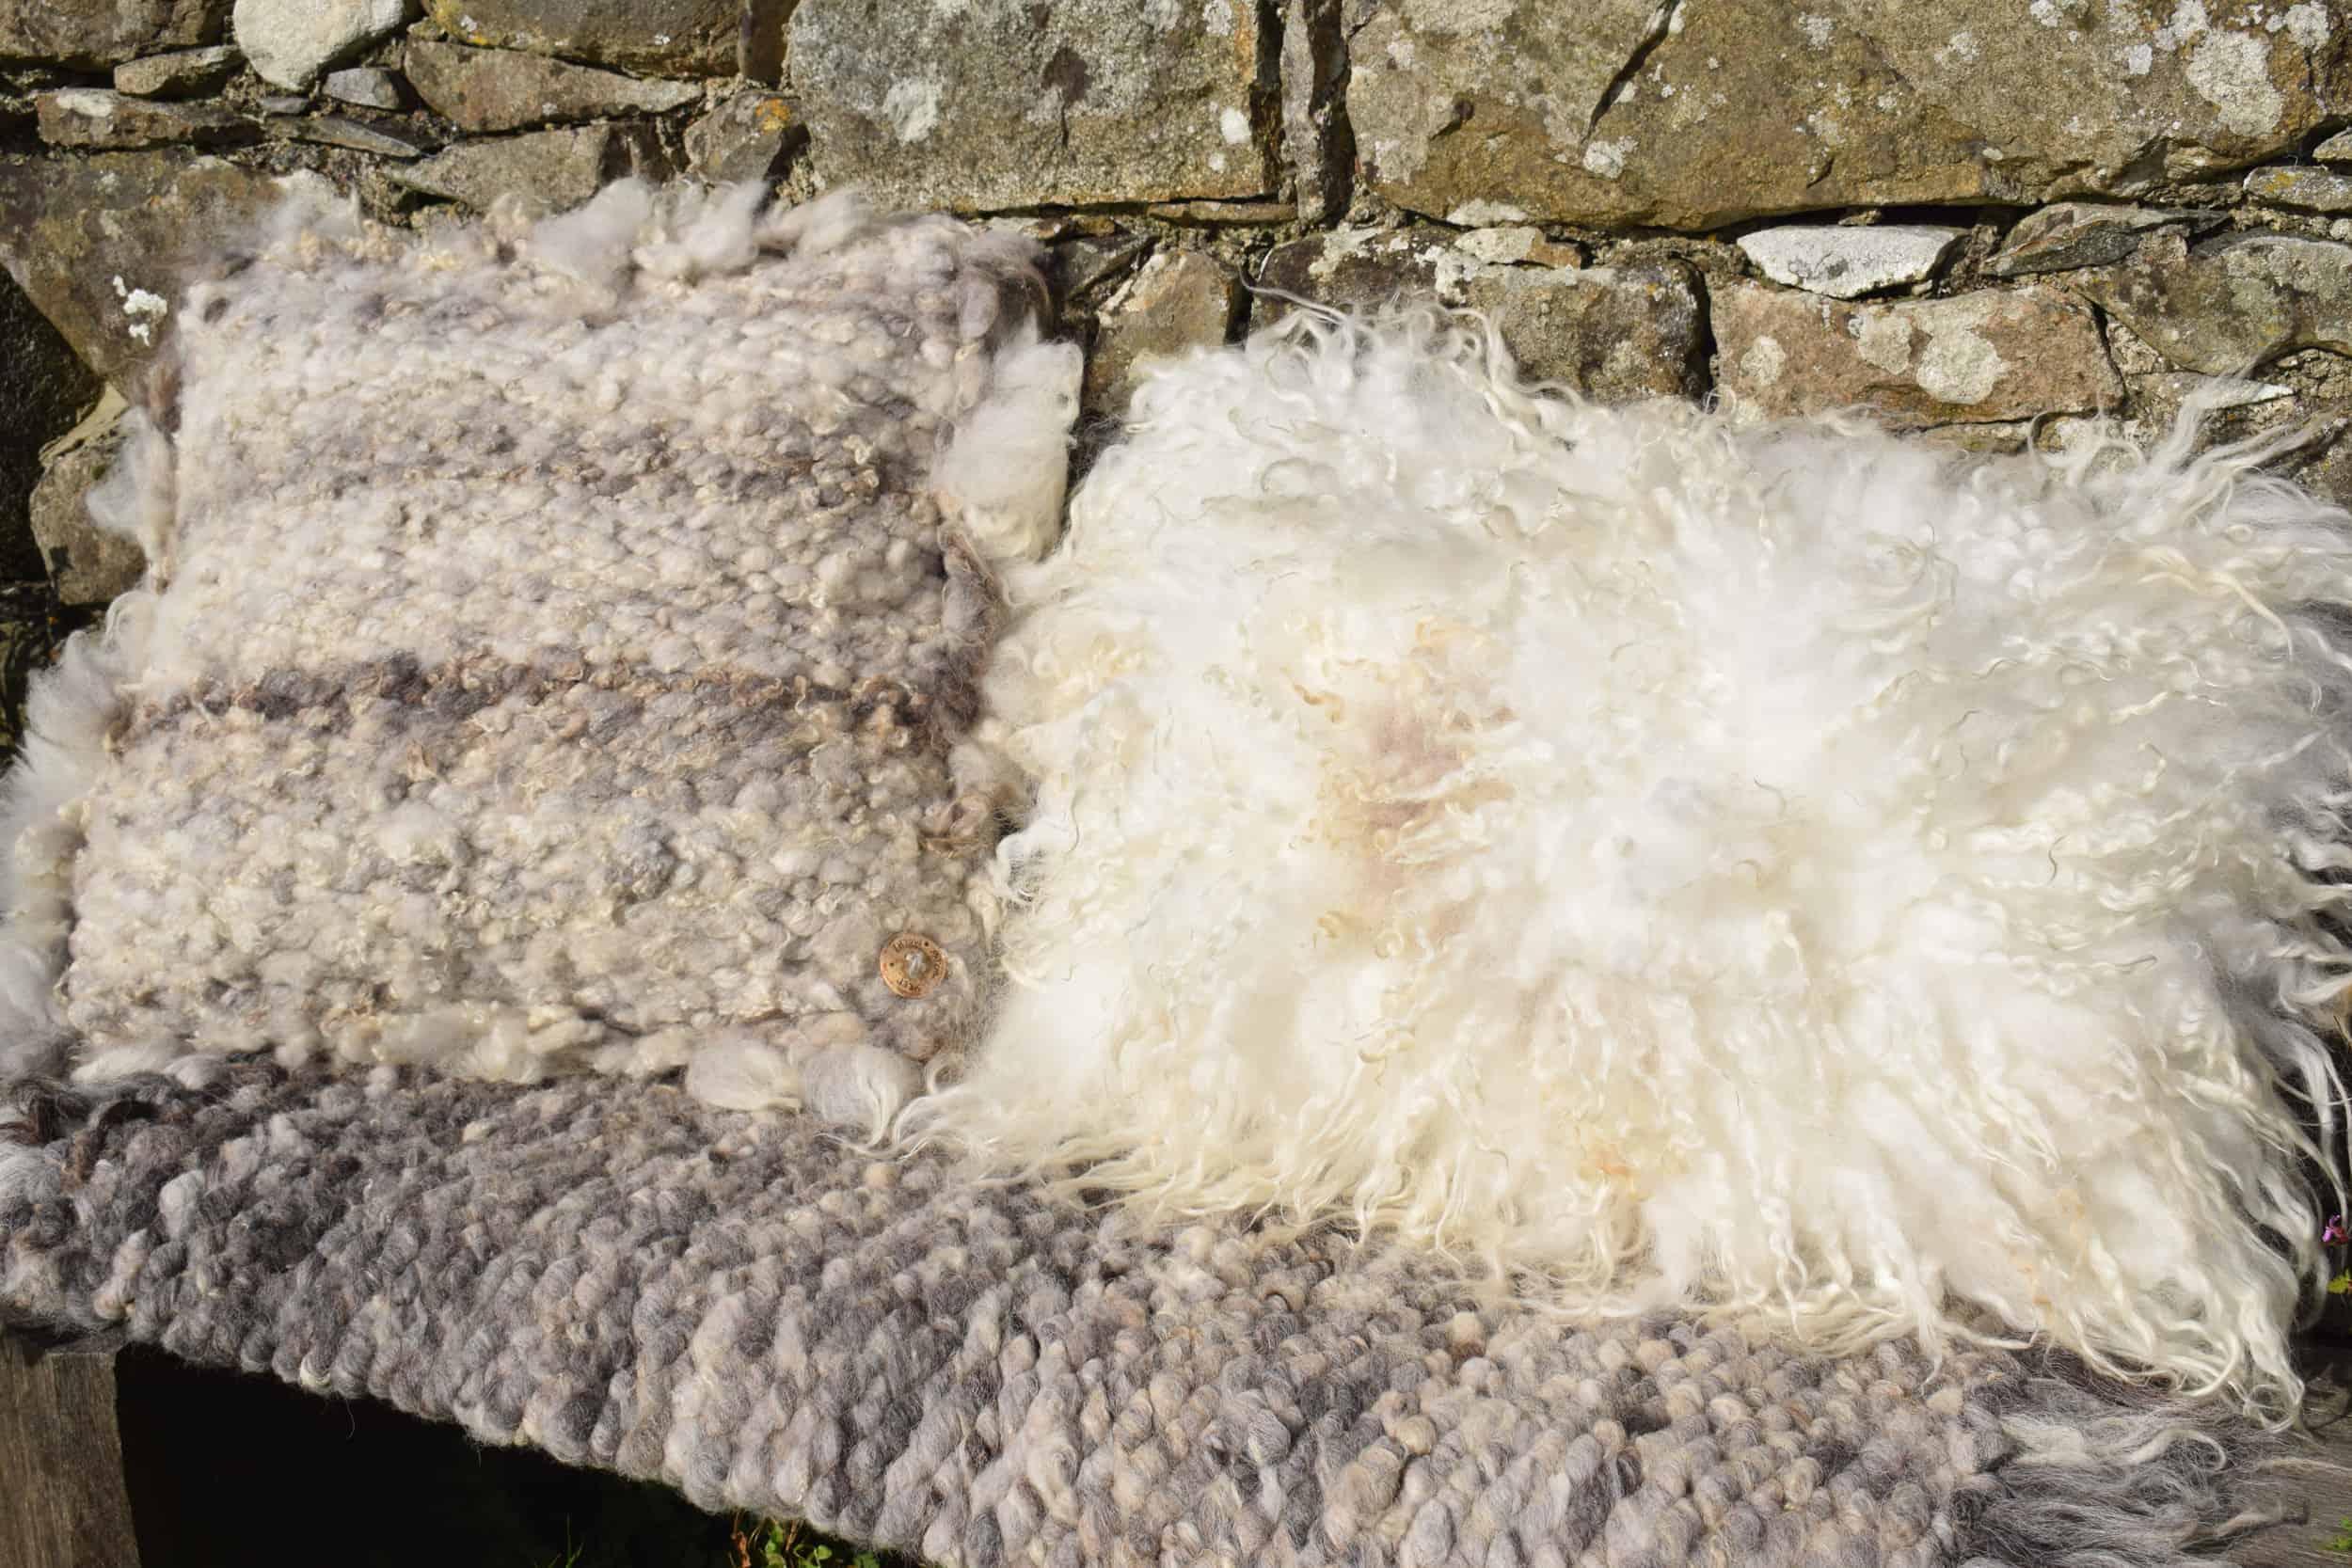 felted fleece pegloom cushion woven wool vegetarian sheepskin dotty icelandic cross